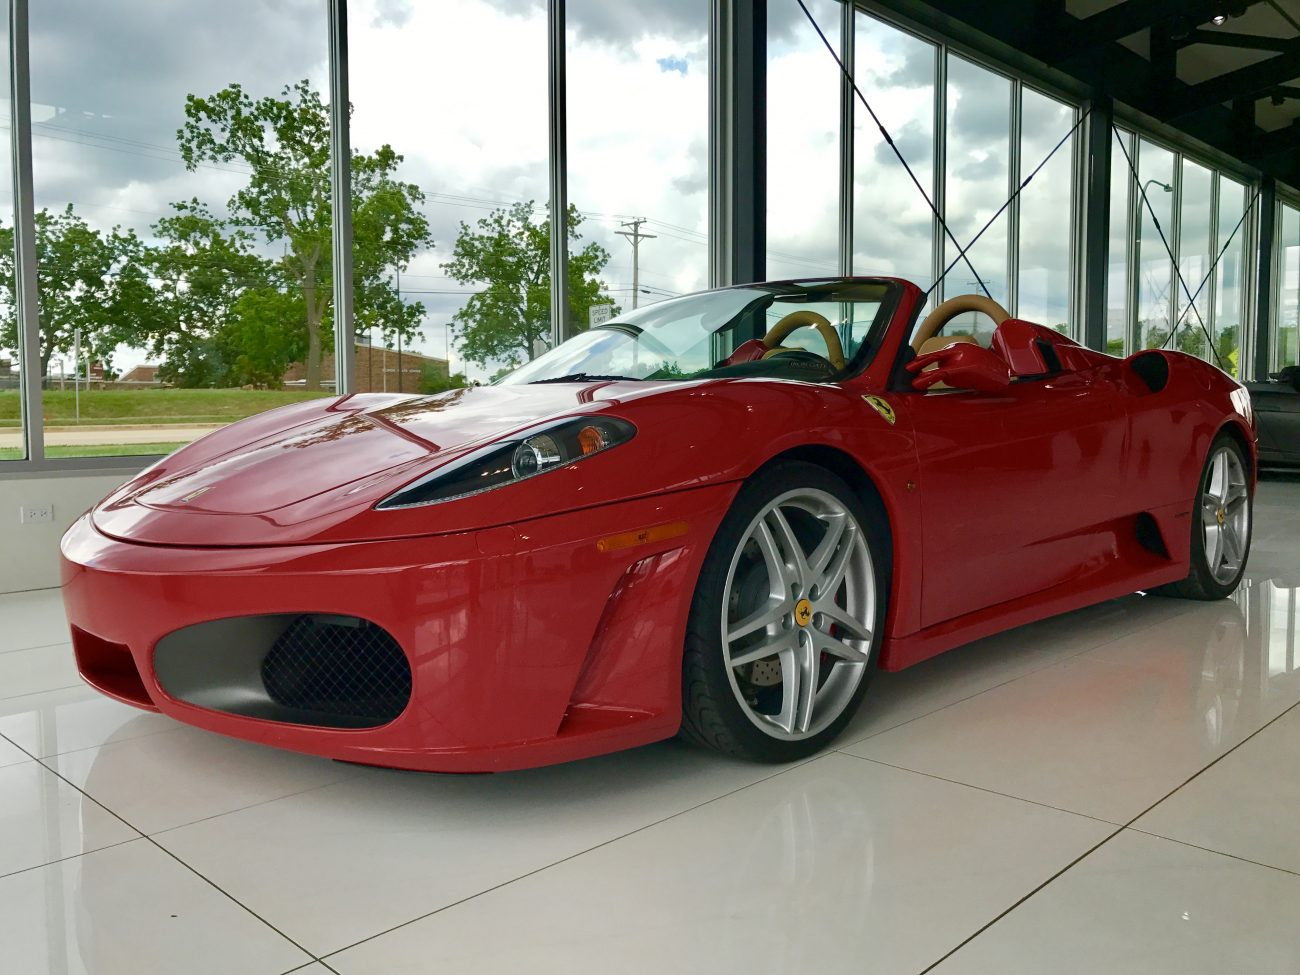 Ferrari F430 Iron Gate Motor Plaza Chicago Motor Cars Jewelry Box